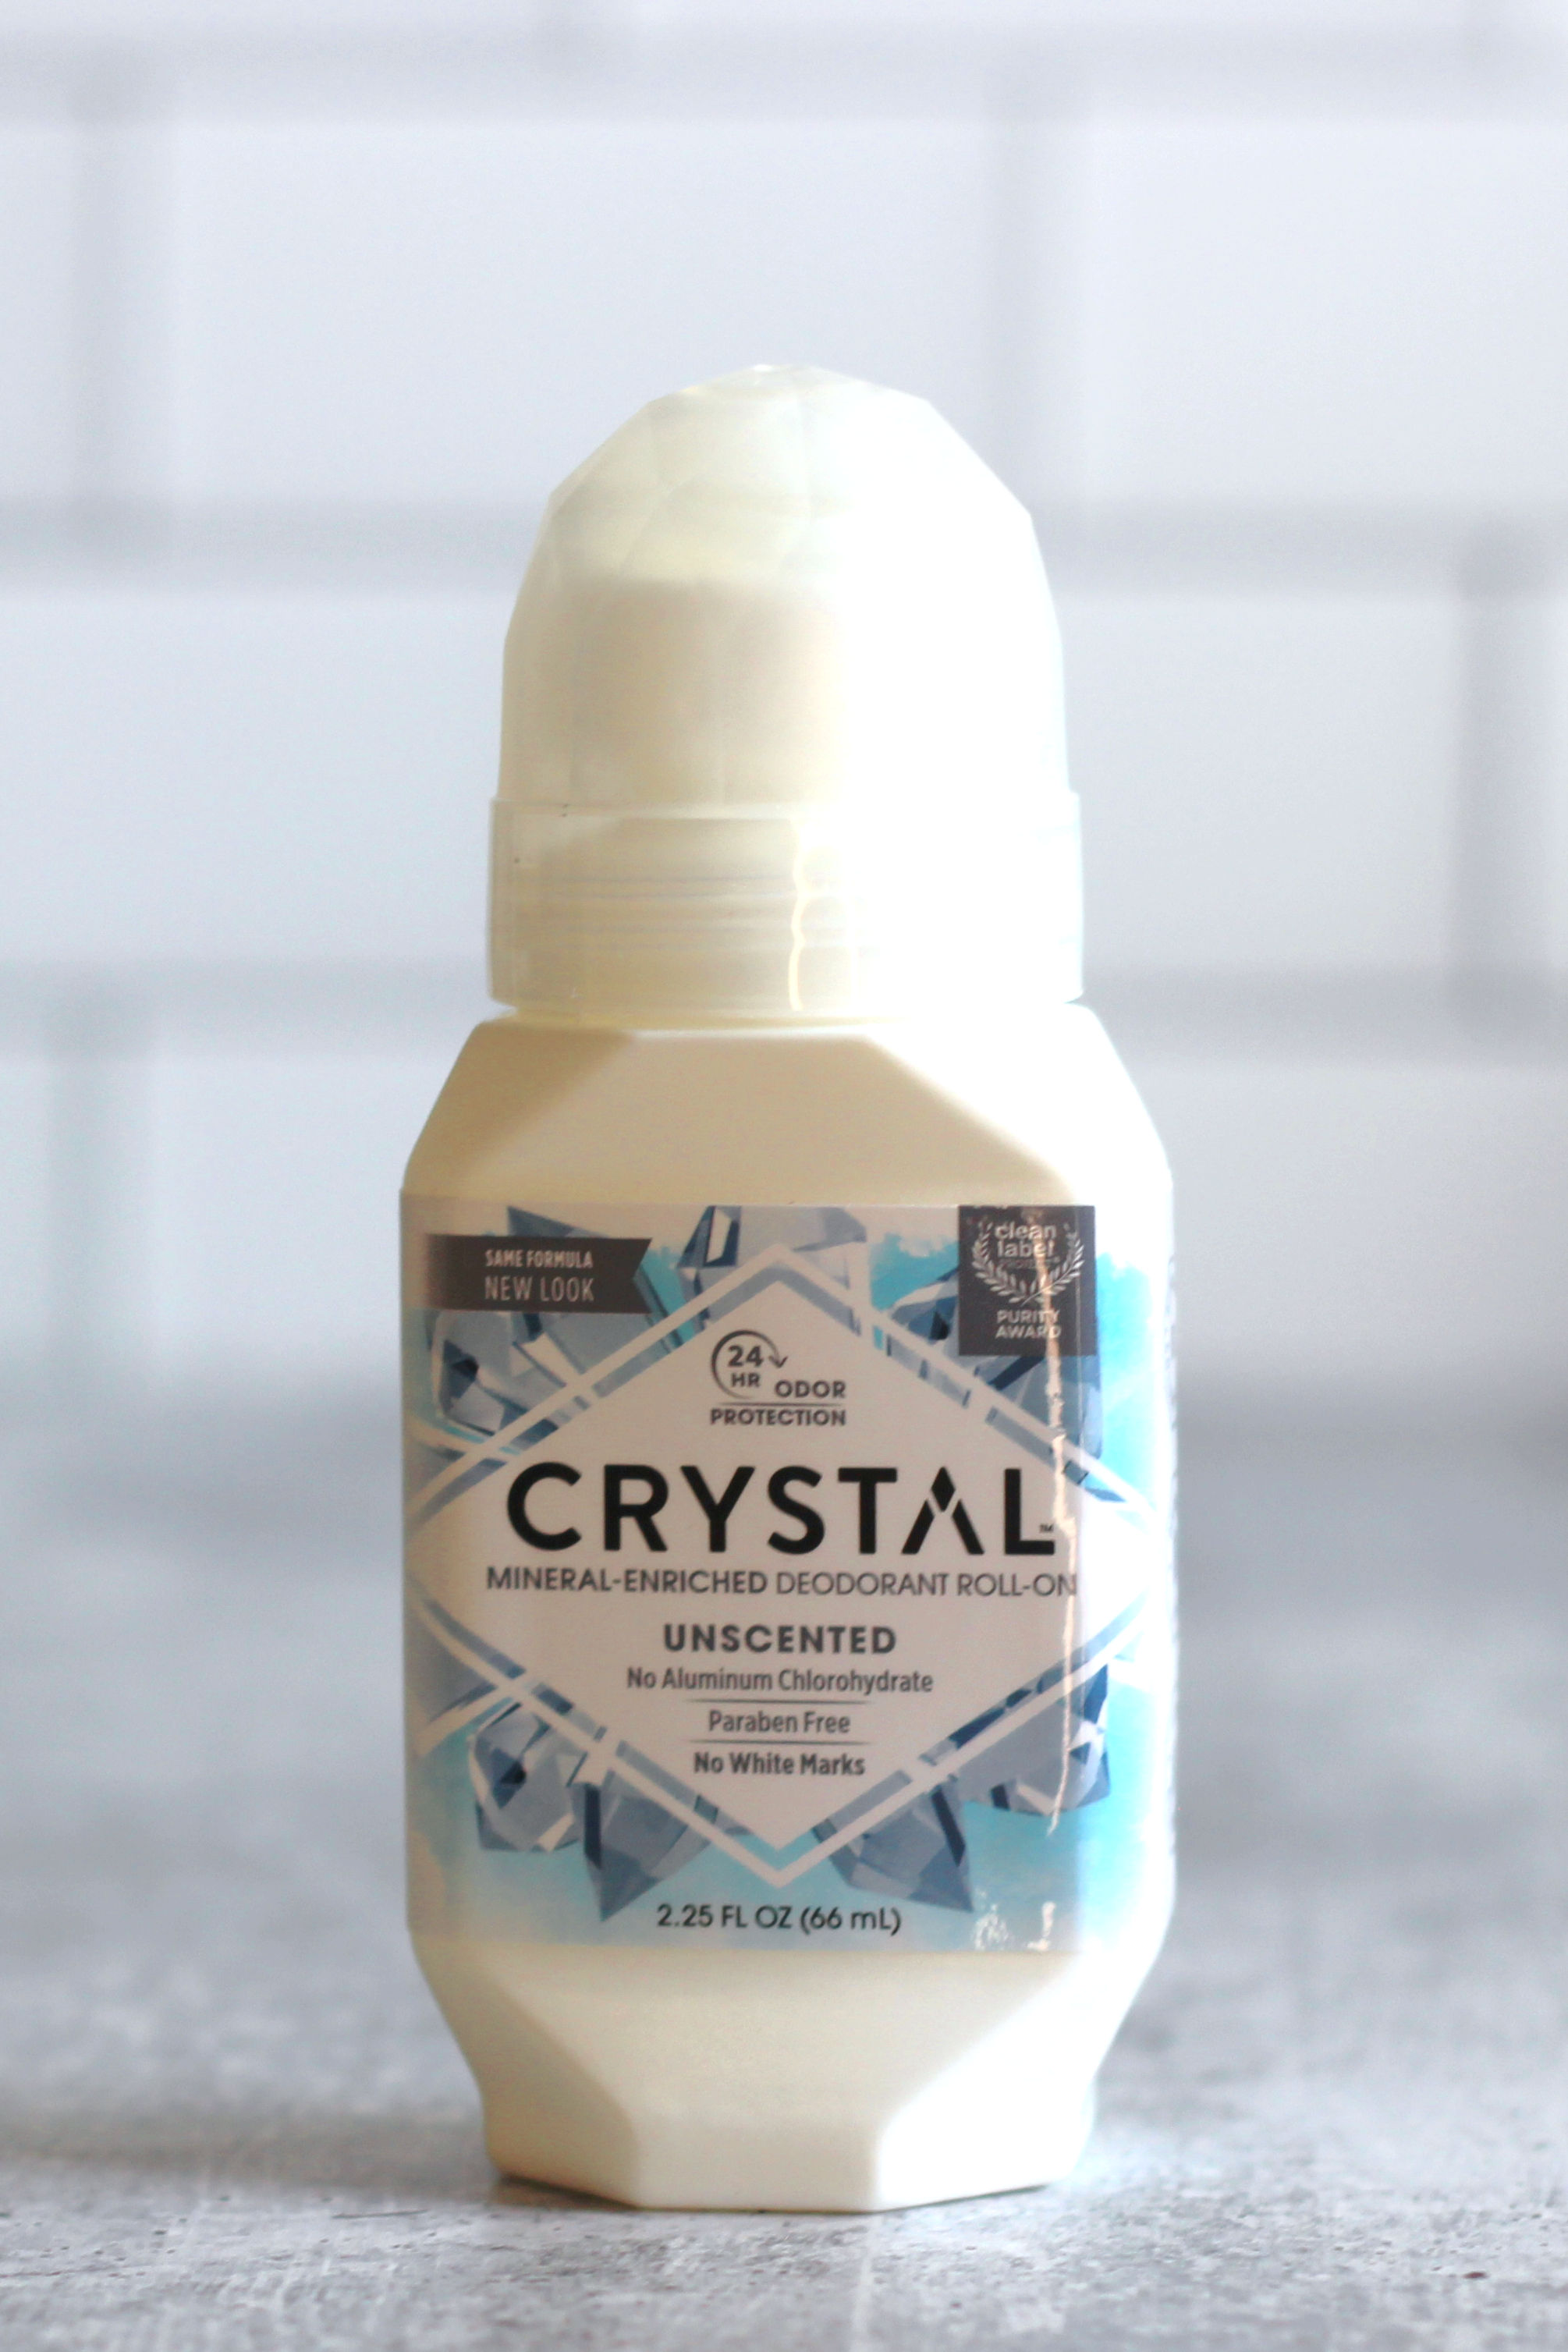 Bottle of roll-on Crystal deodorant